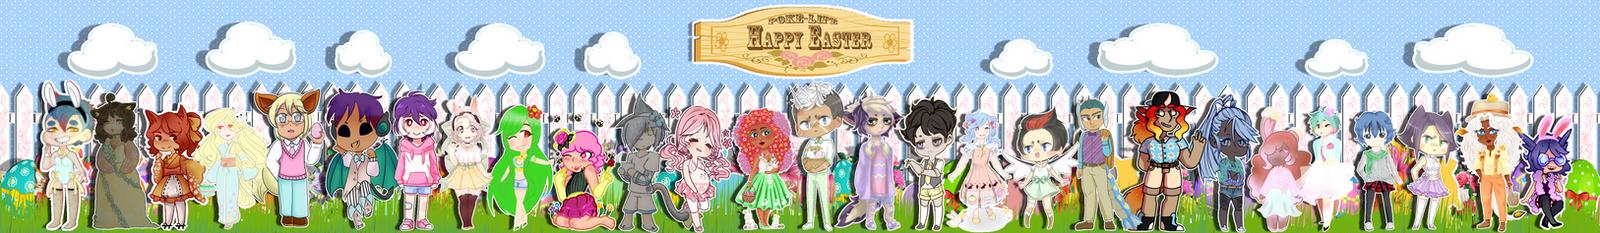 Poke-Life Happy Easter by Spirit-Okami